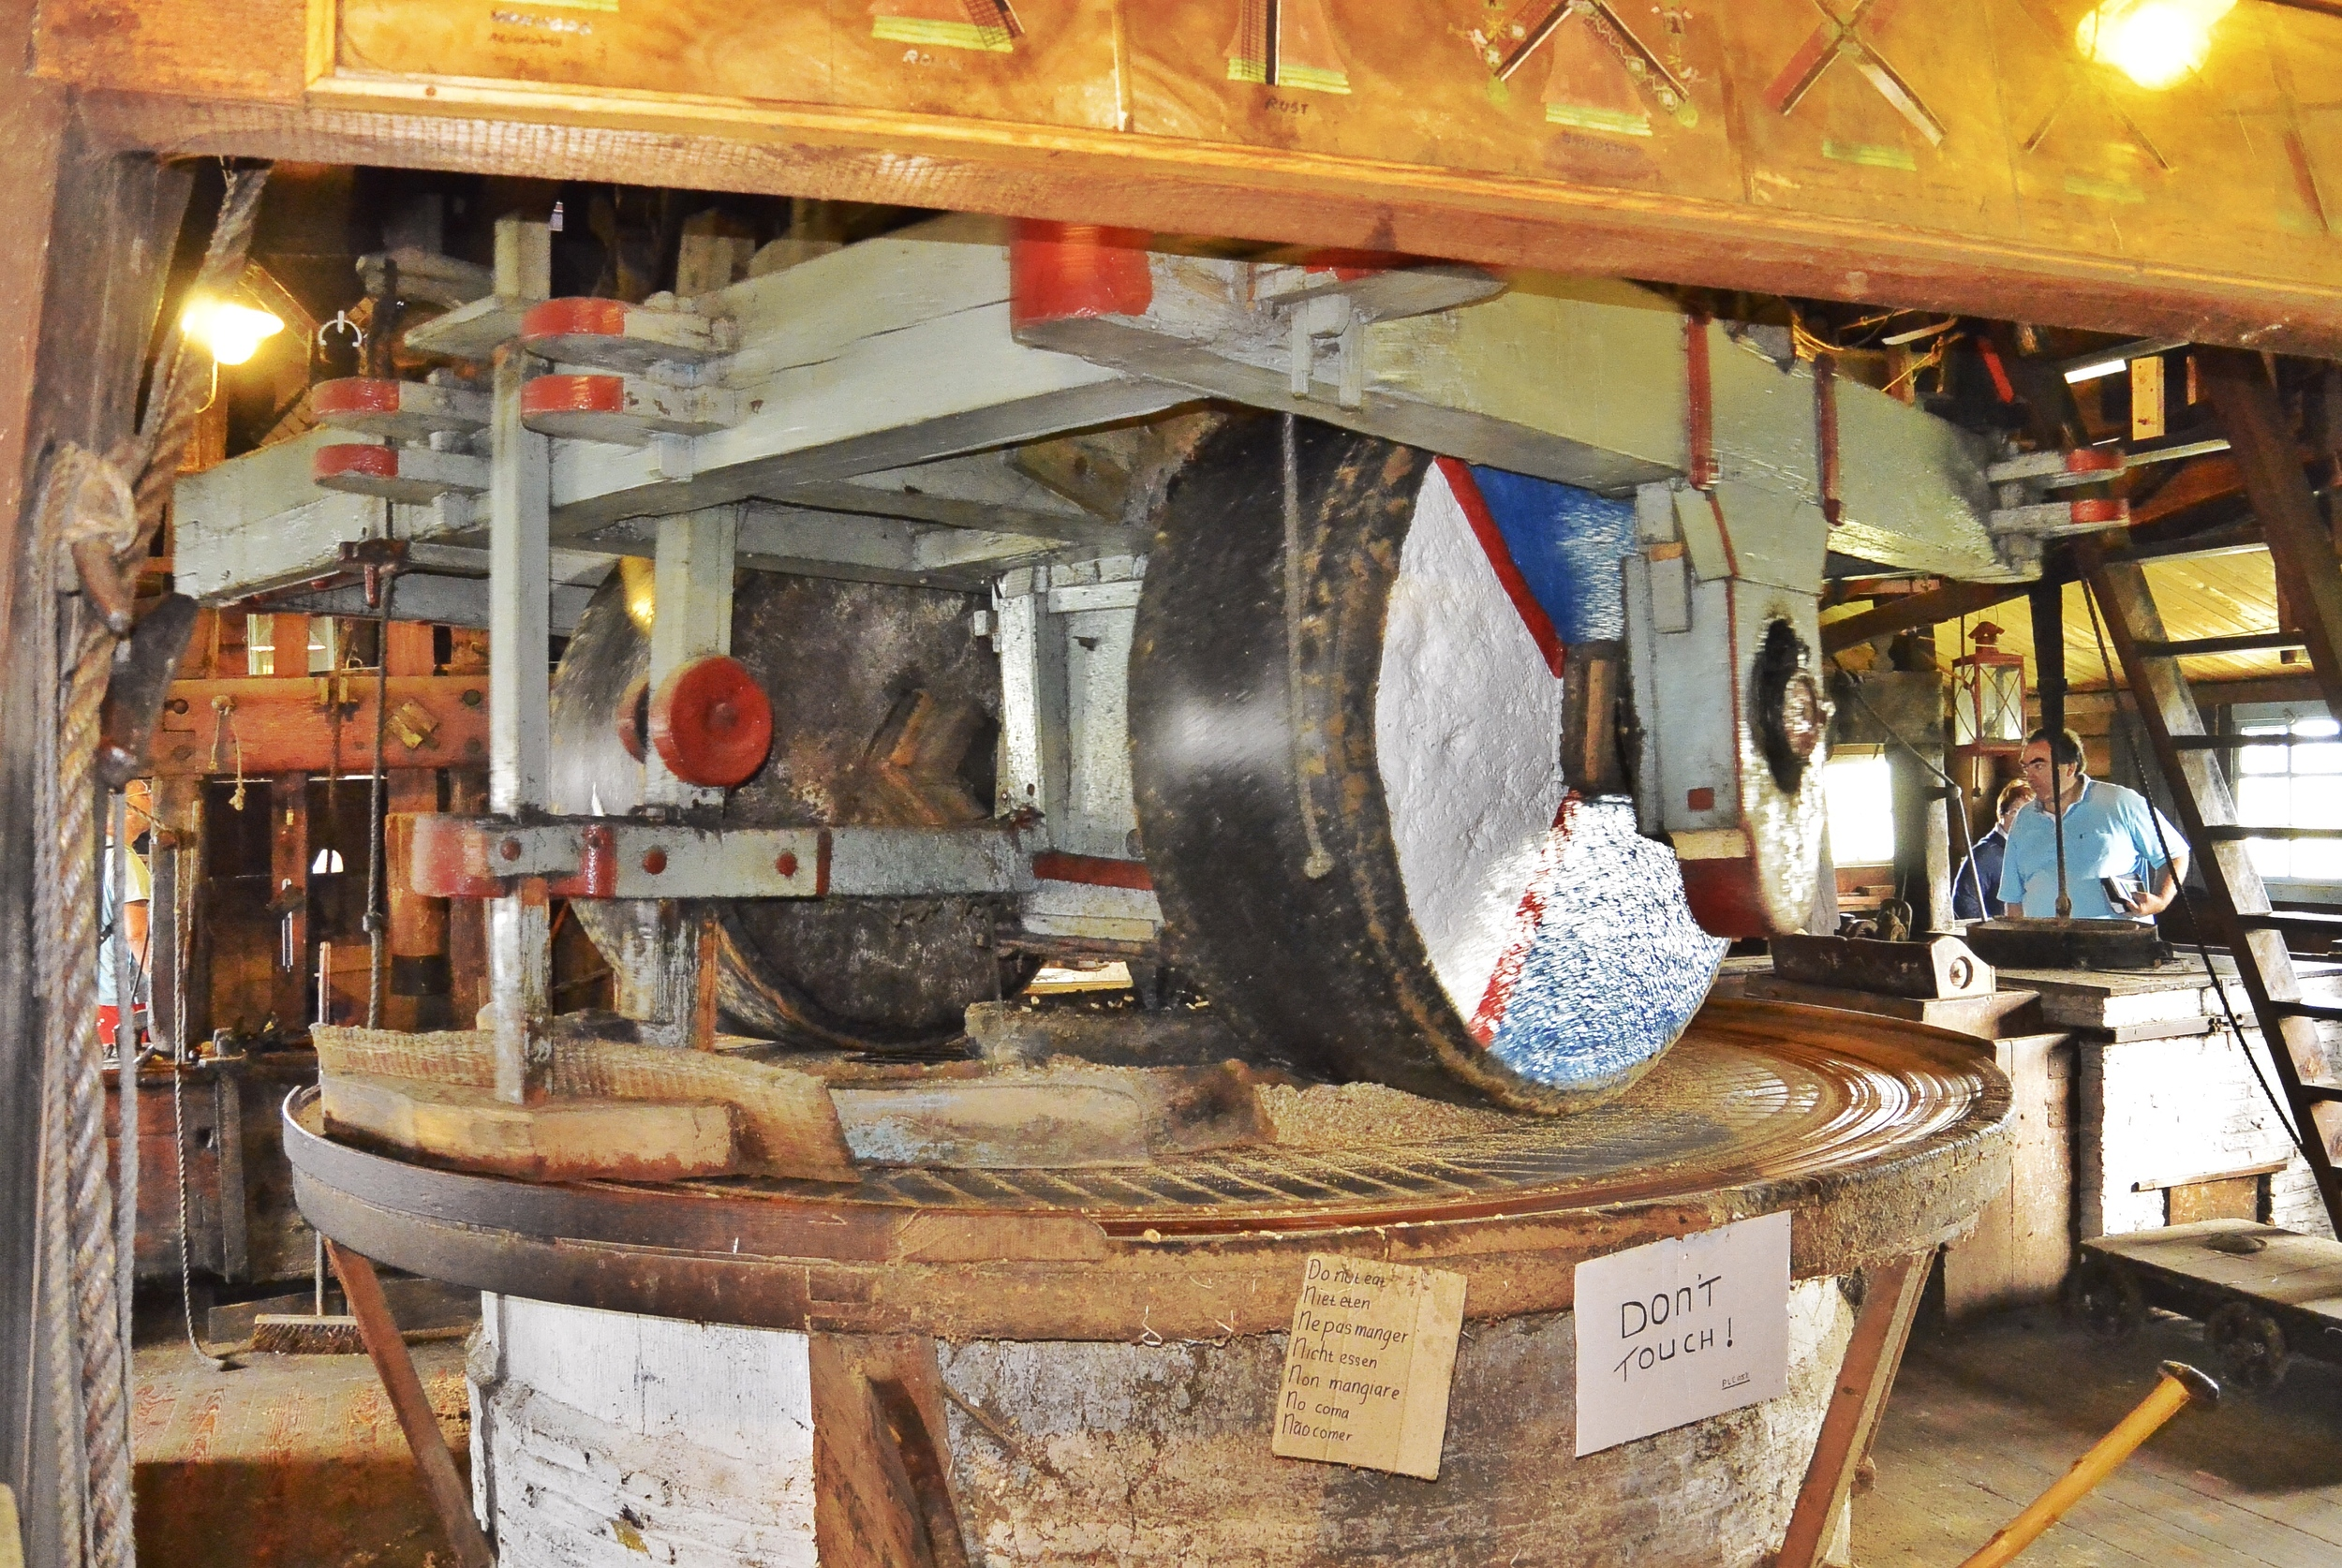 De Zoeker Windmill Grinding Nuts into oil in Zaanse Schans